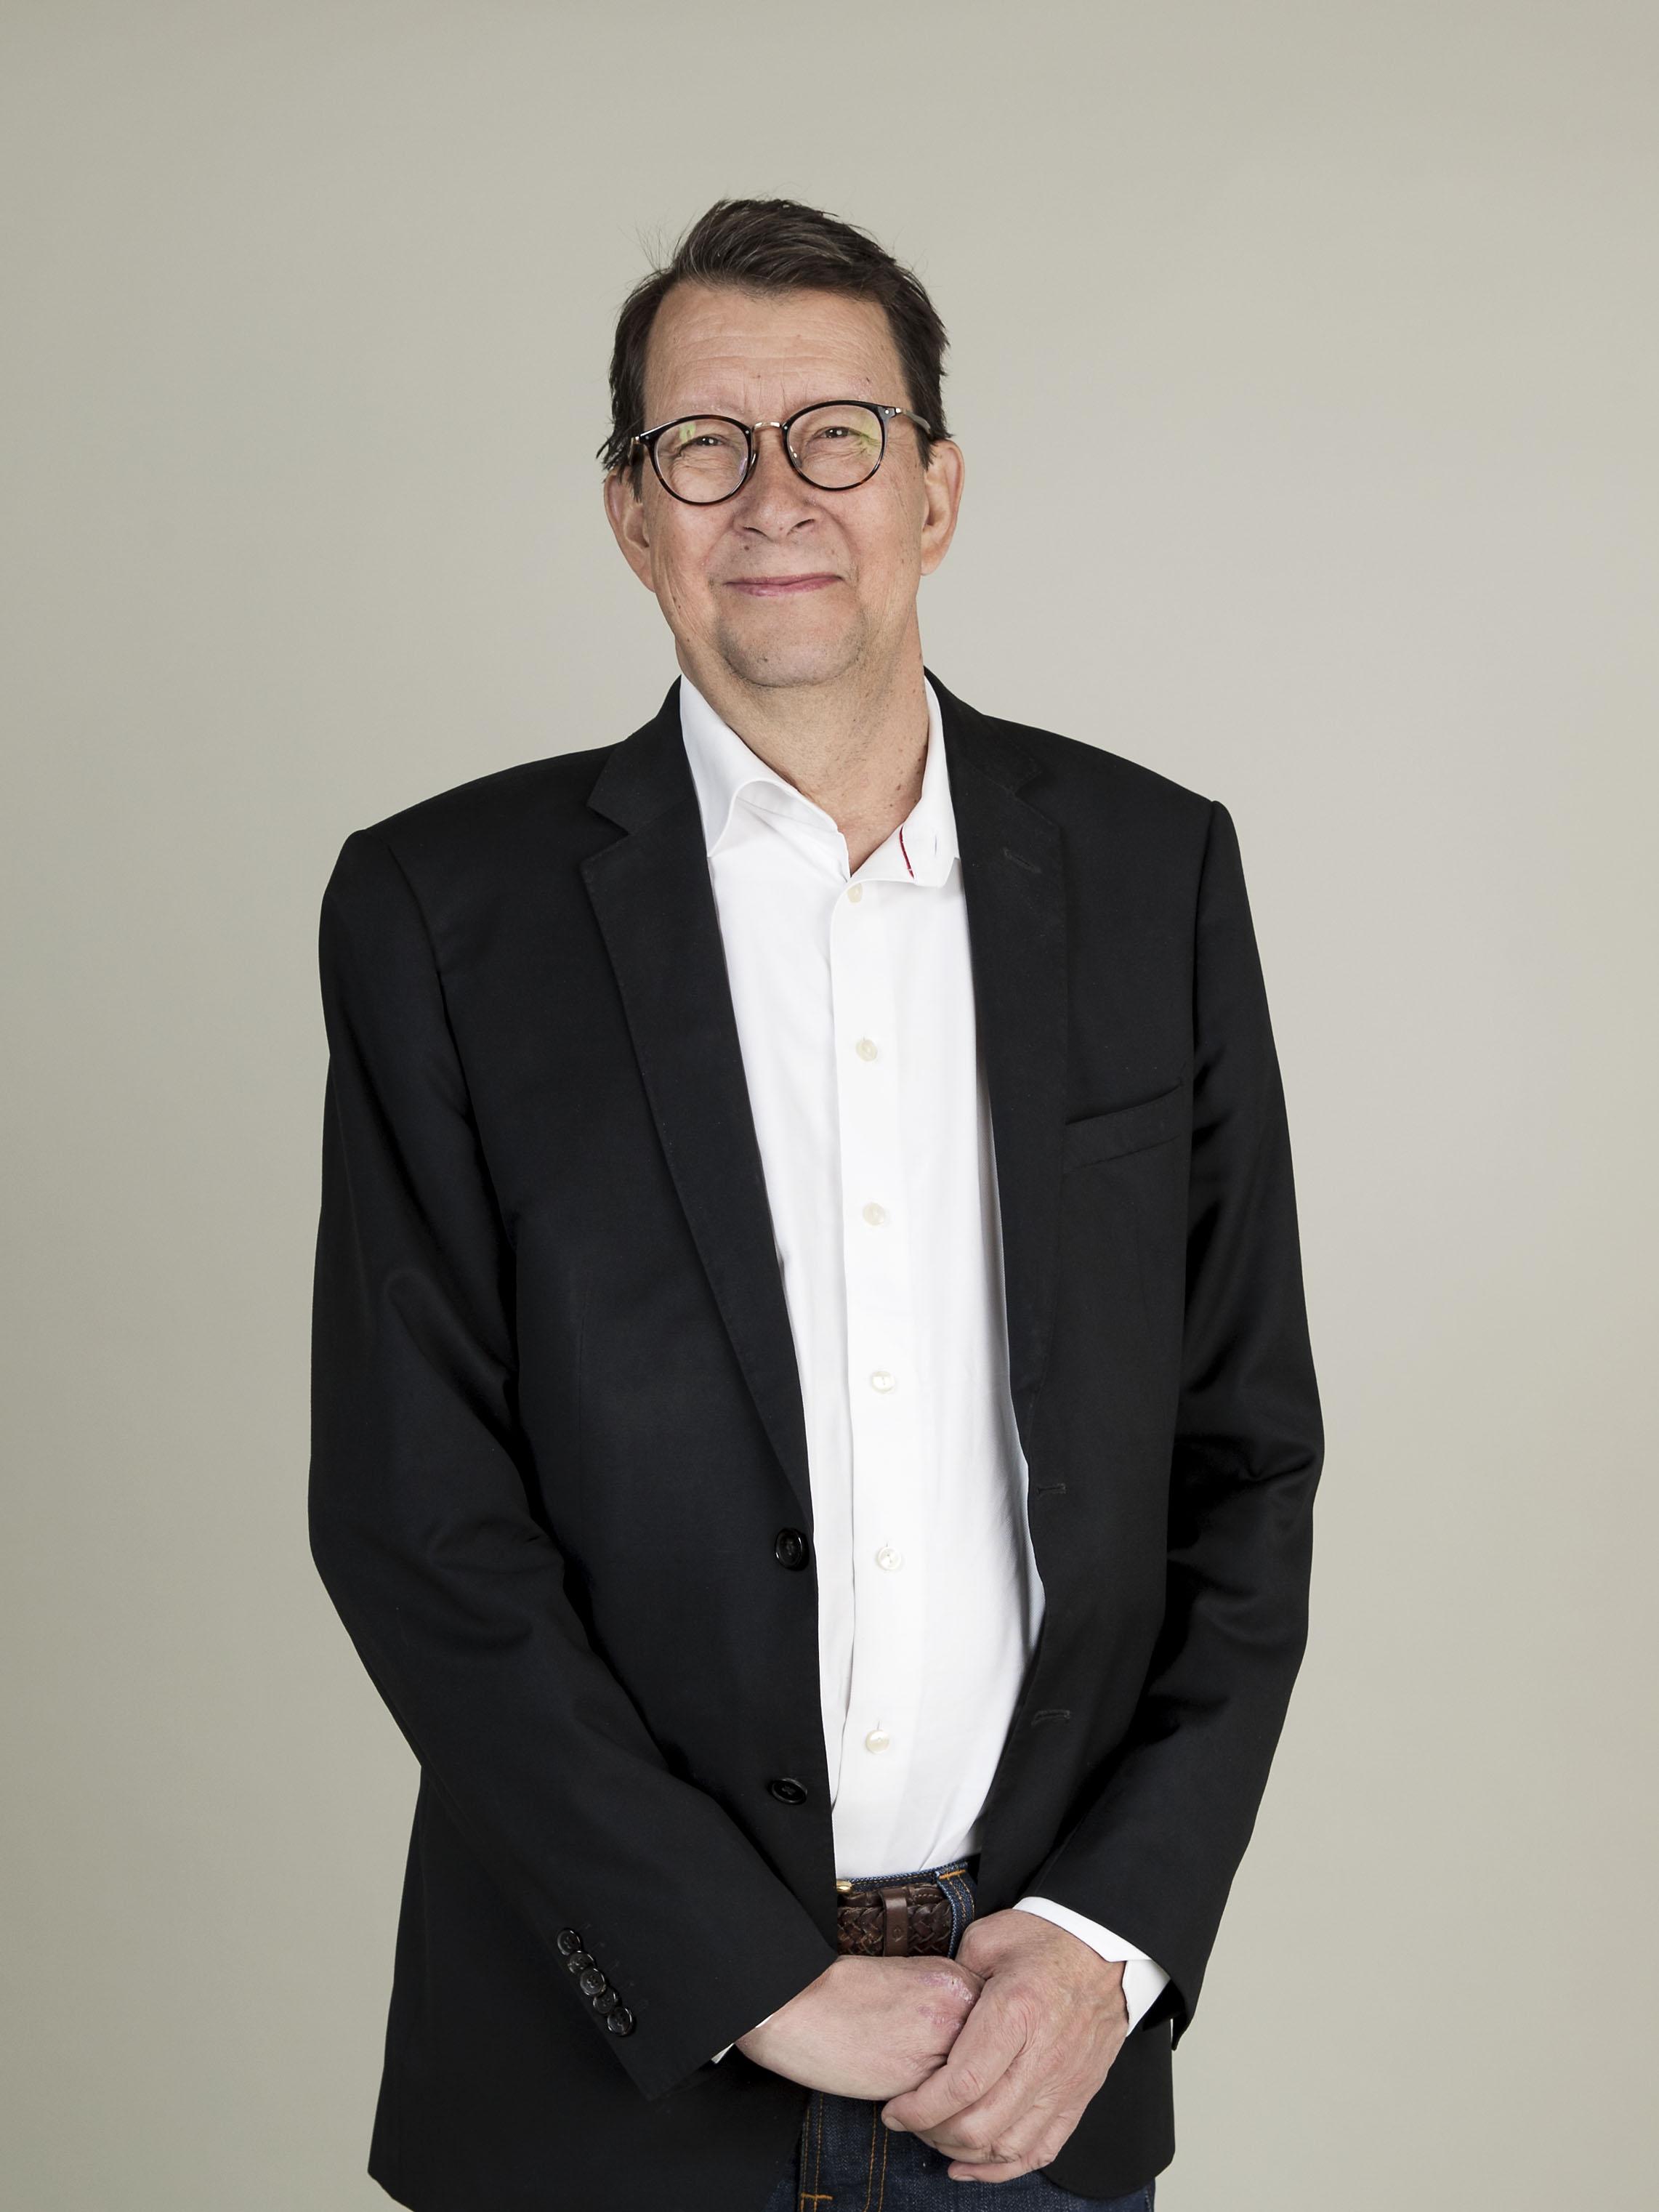 Gunnar Franck